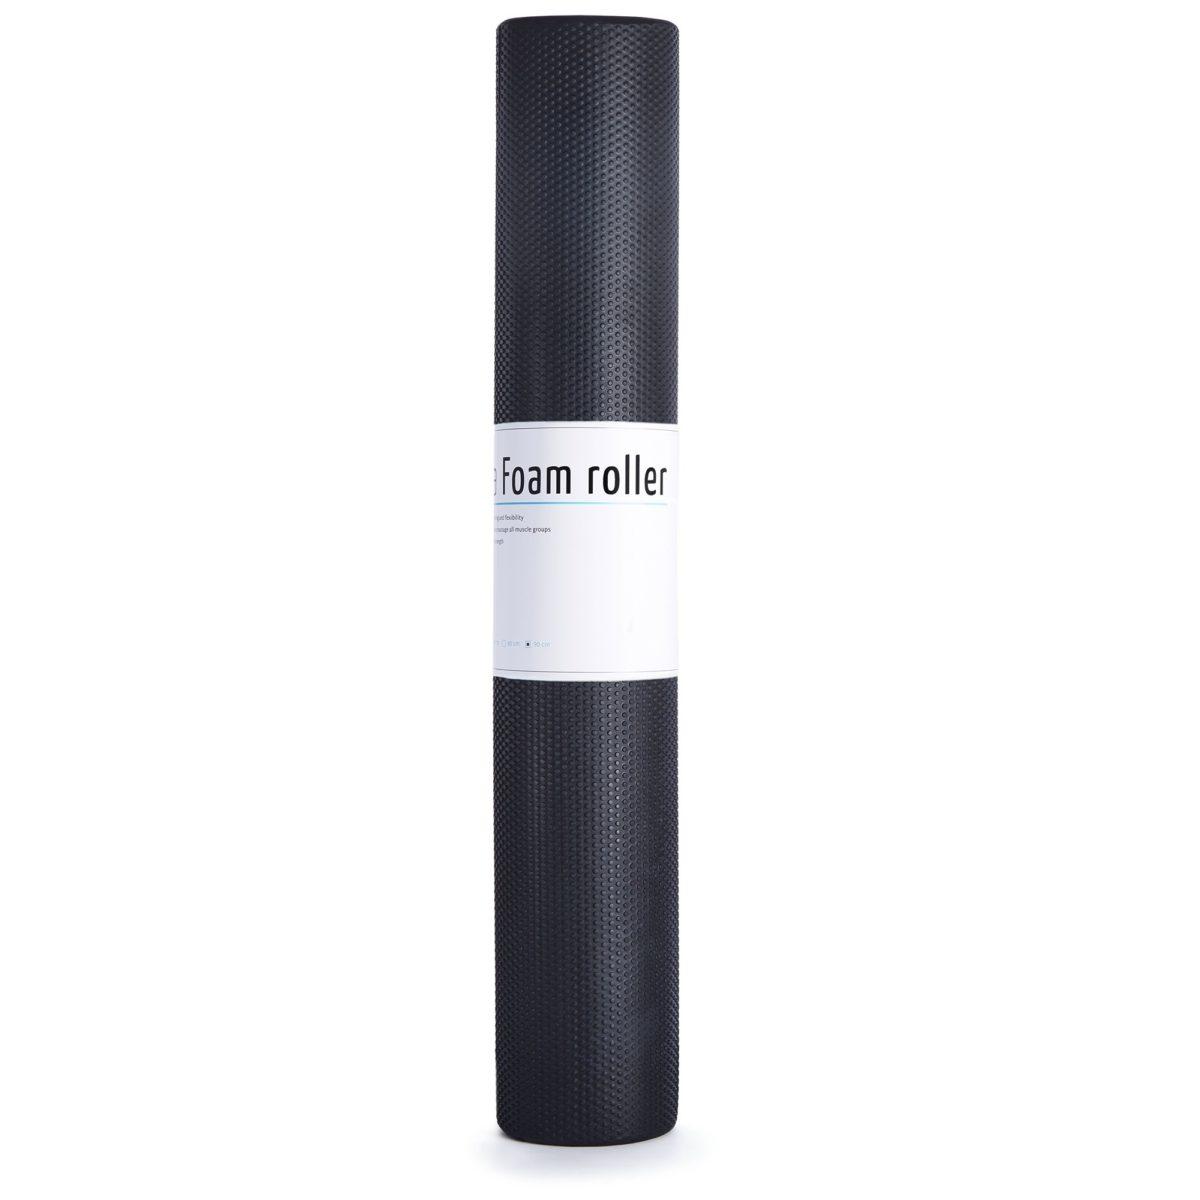 MASSAGE ROLLER EASY FITNESS 90CM EASY FITNESS : Kolor - Czarny, Twardość - Średni